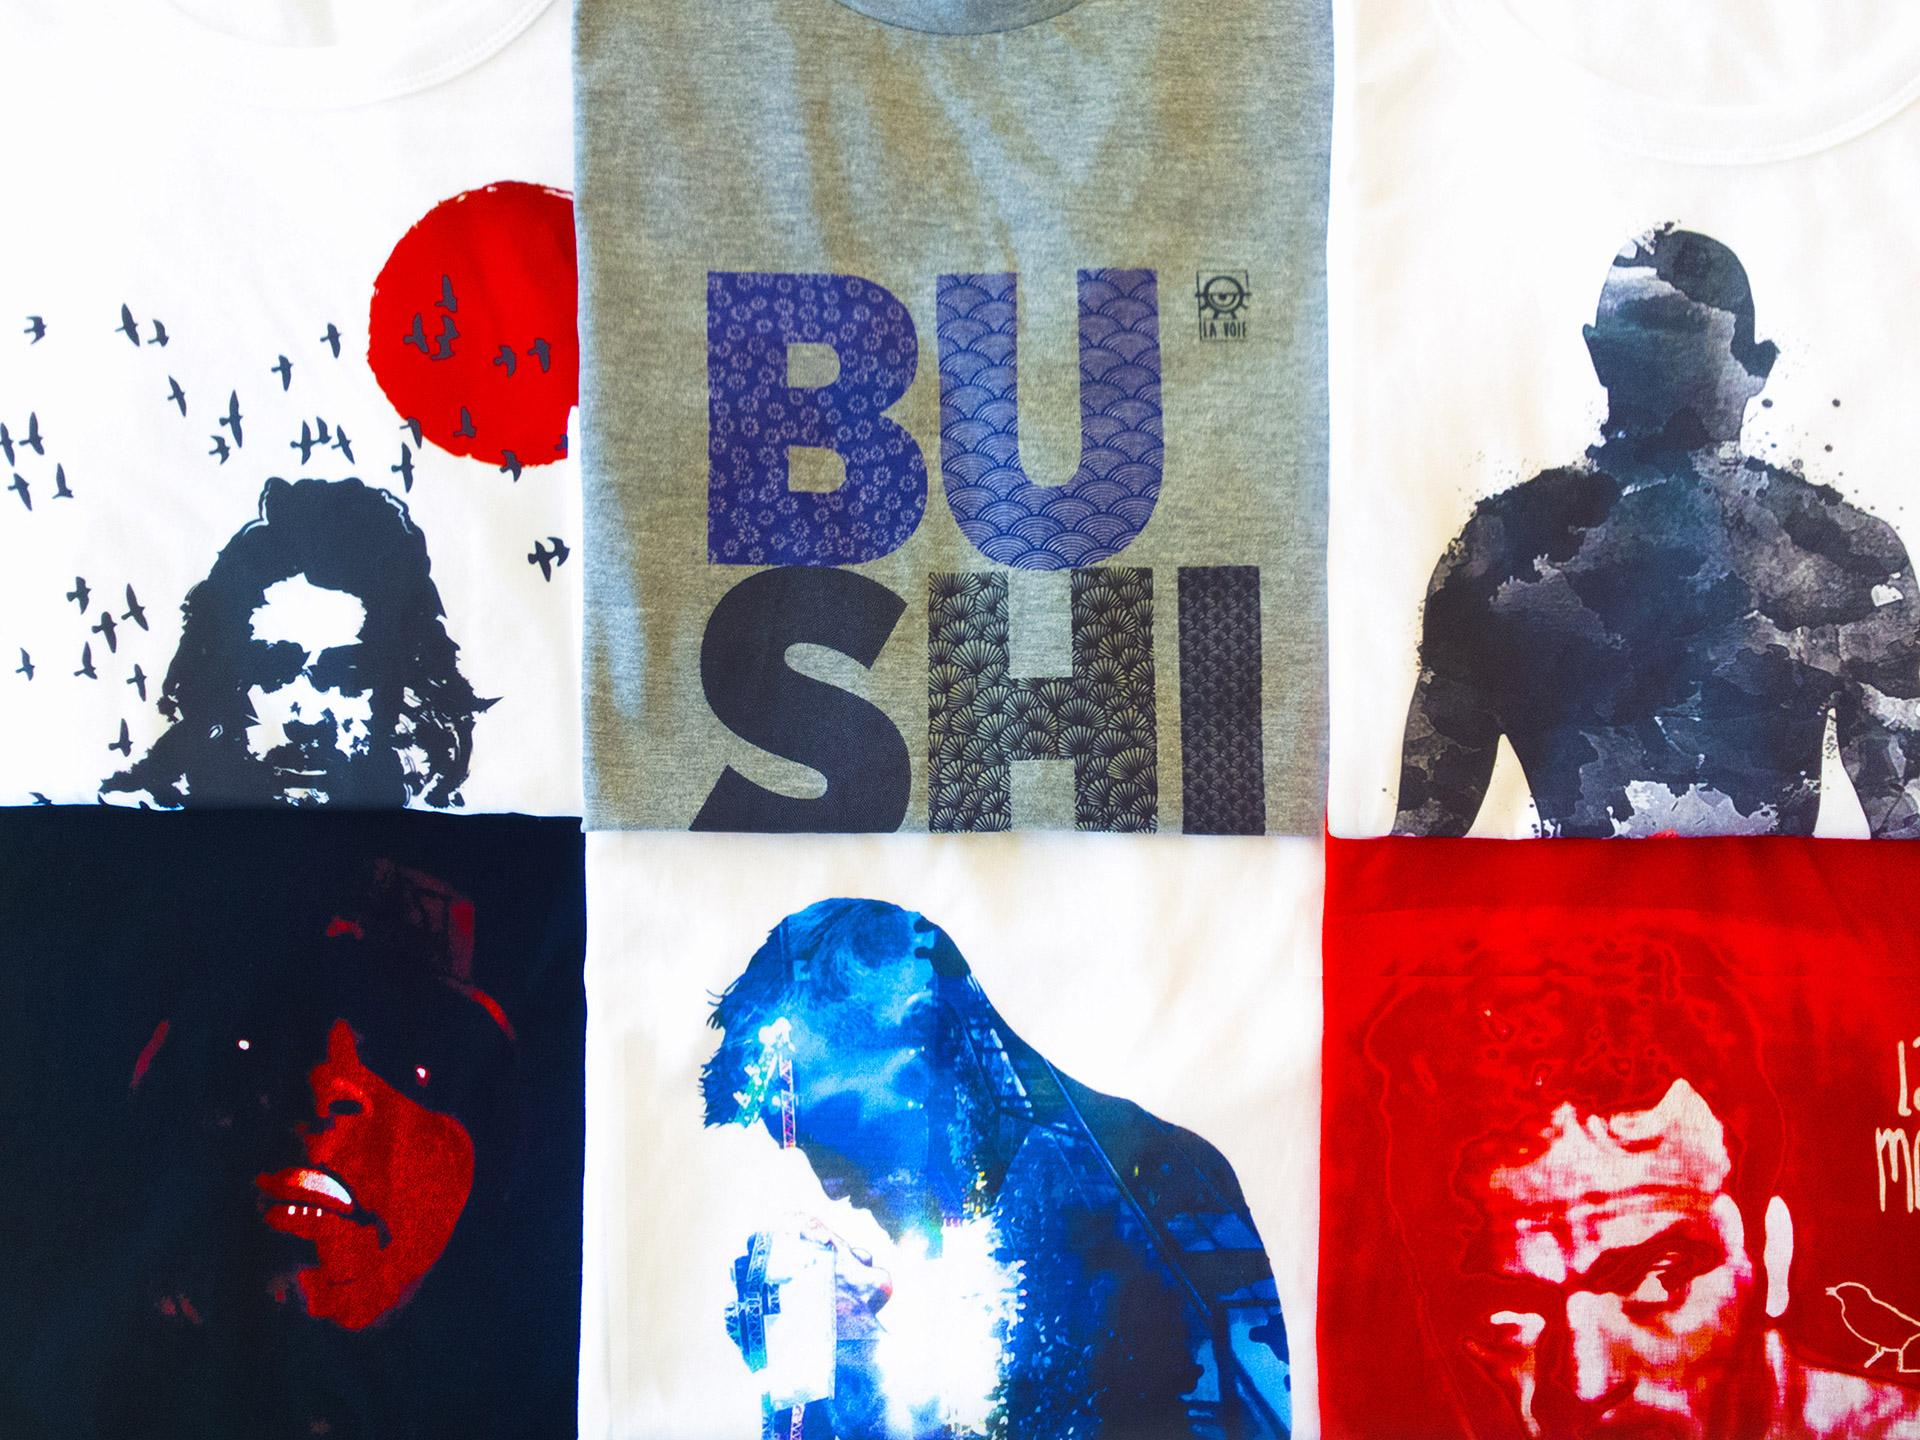 carrés t shirt la marque - L'histoire de la marque